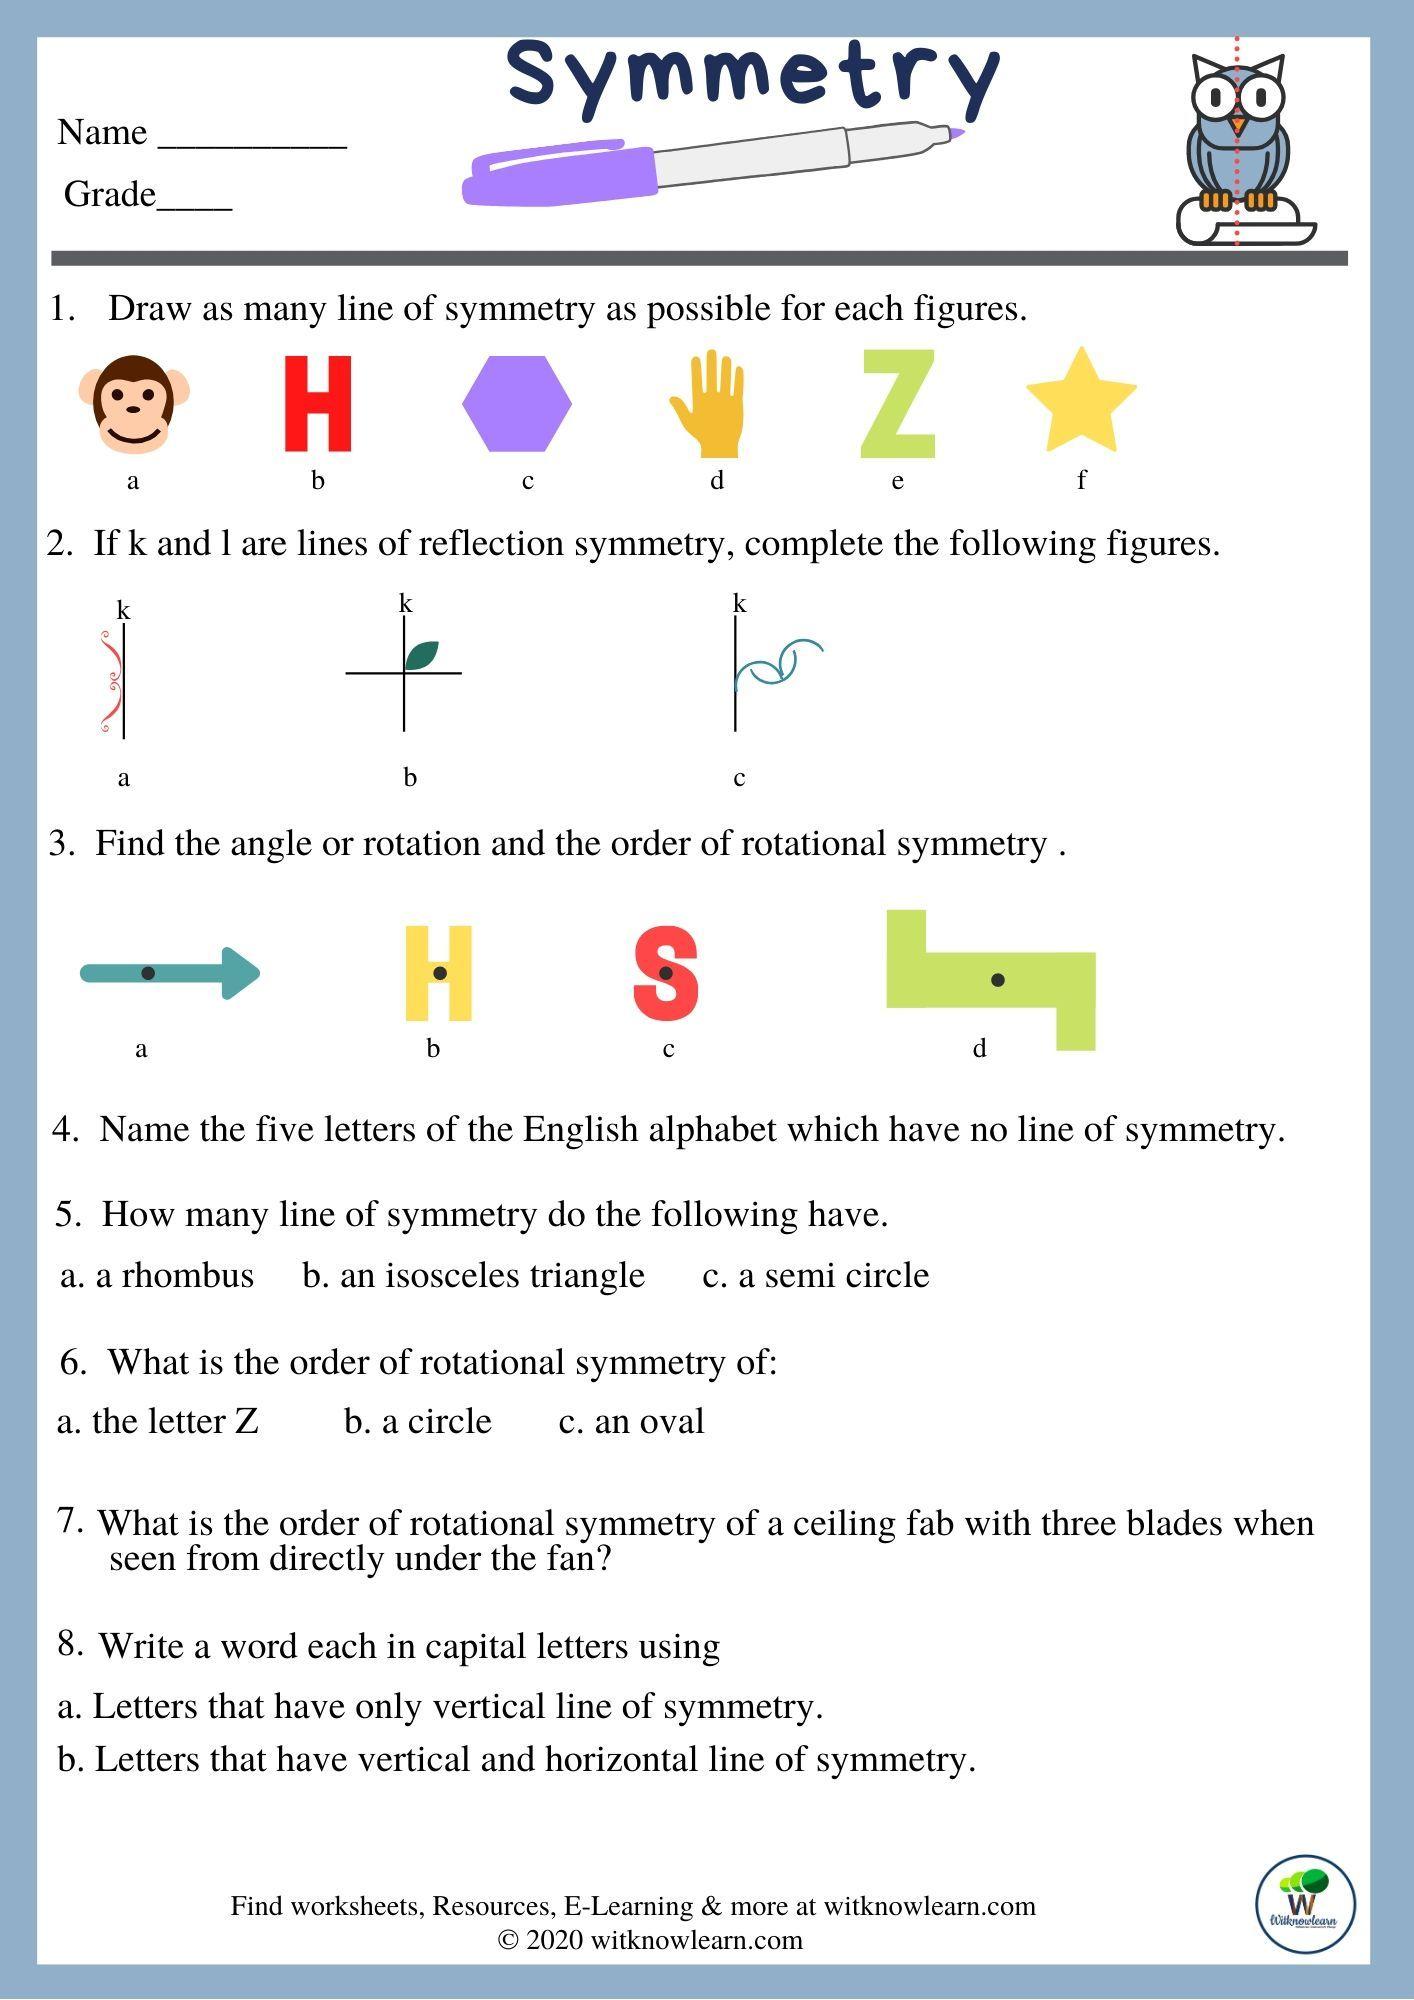 symmetry worksheets for kids   Symmetry worksheets [ 2000 x 1414 Pixel ]